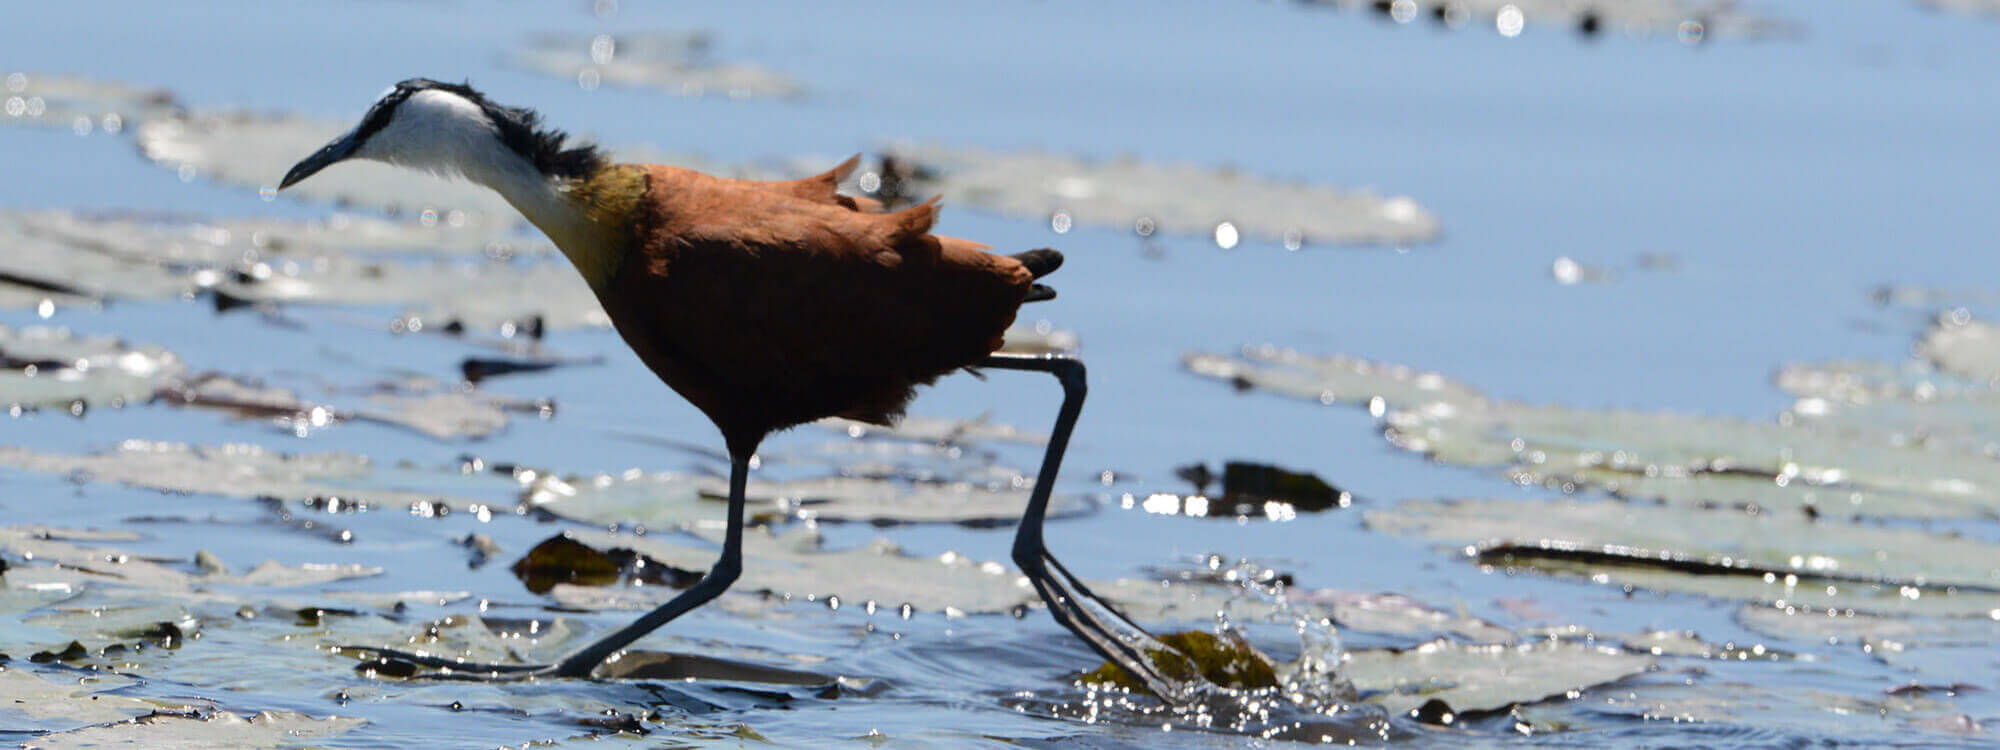 Rettung bedrohter Wildtiere